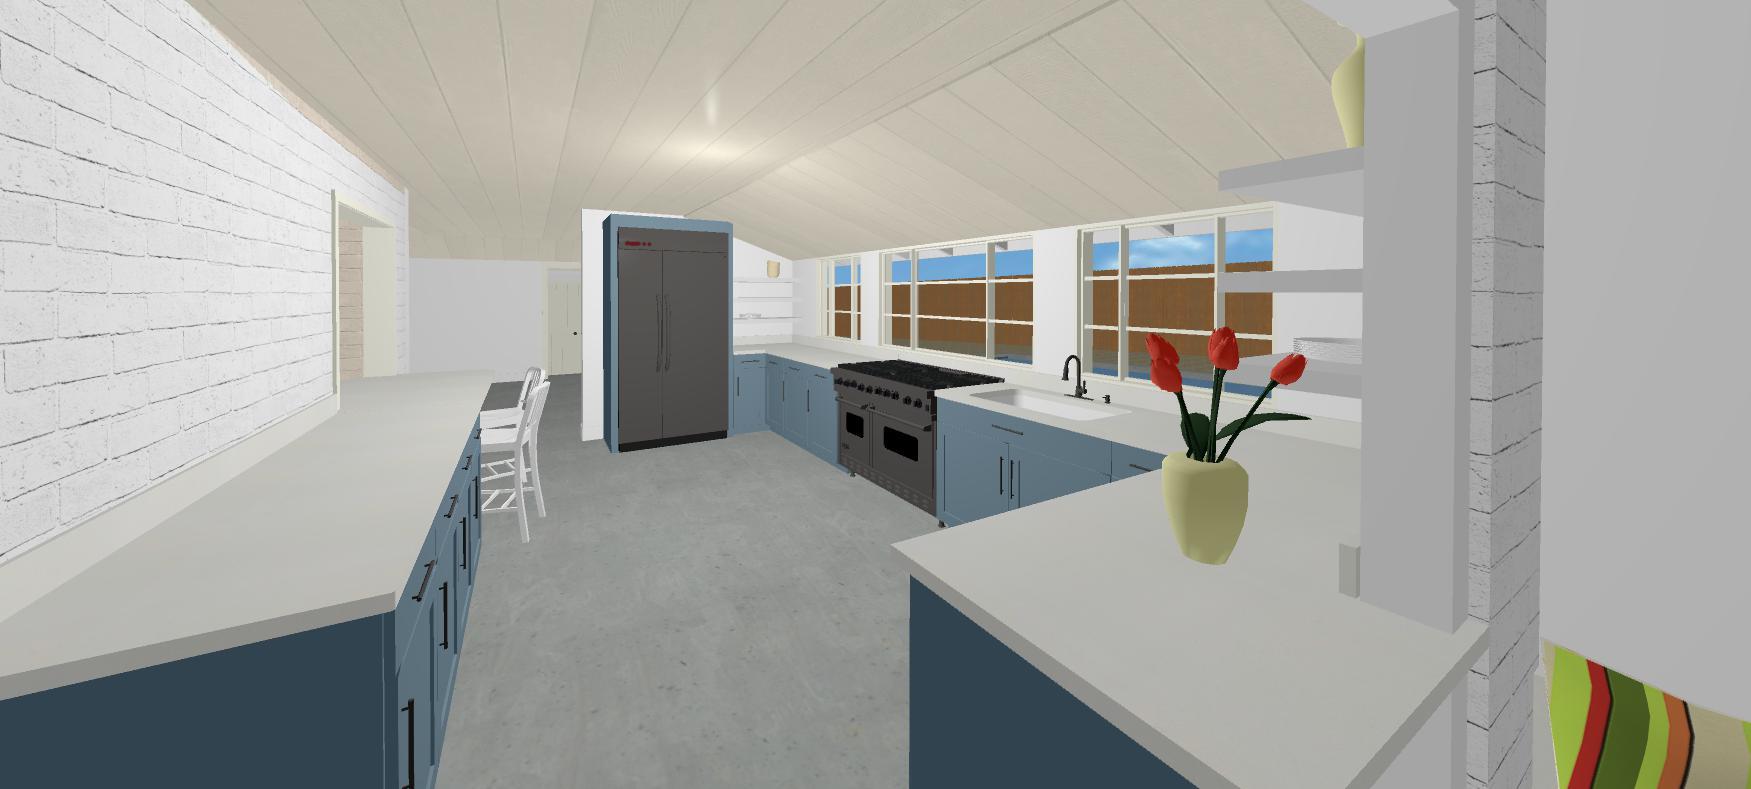 Ojai_remodel_Arbolada_kitchen2_2016_0122